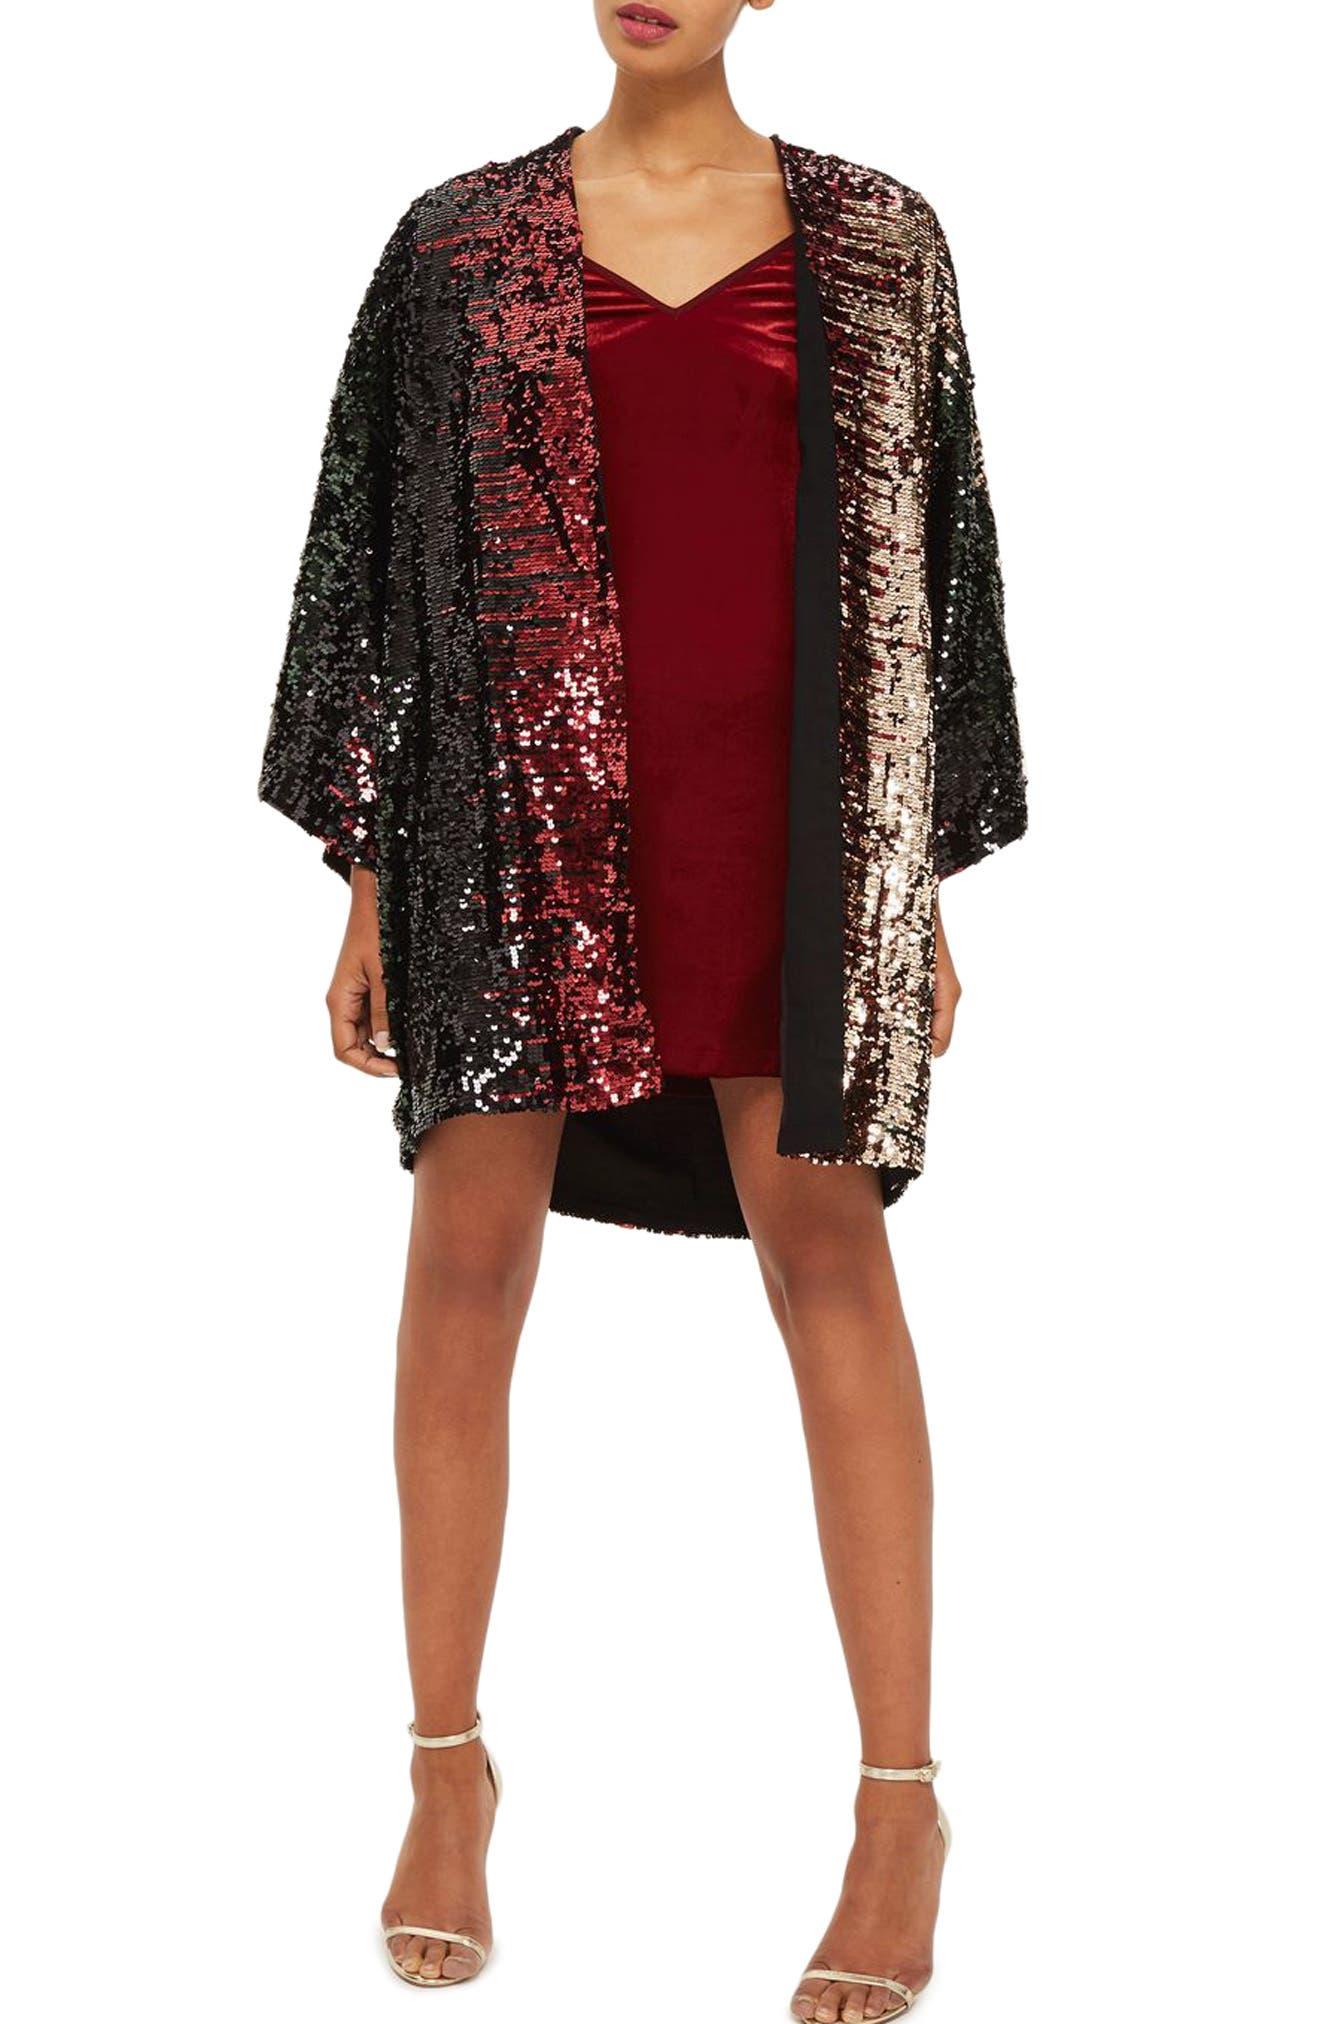 Topshop Calypso Sequin Kimono